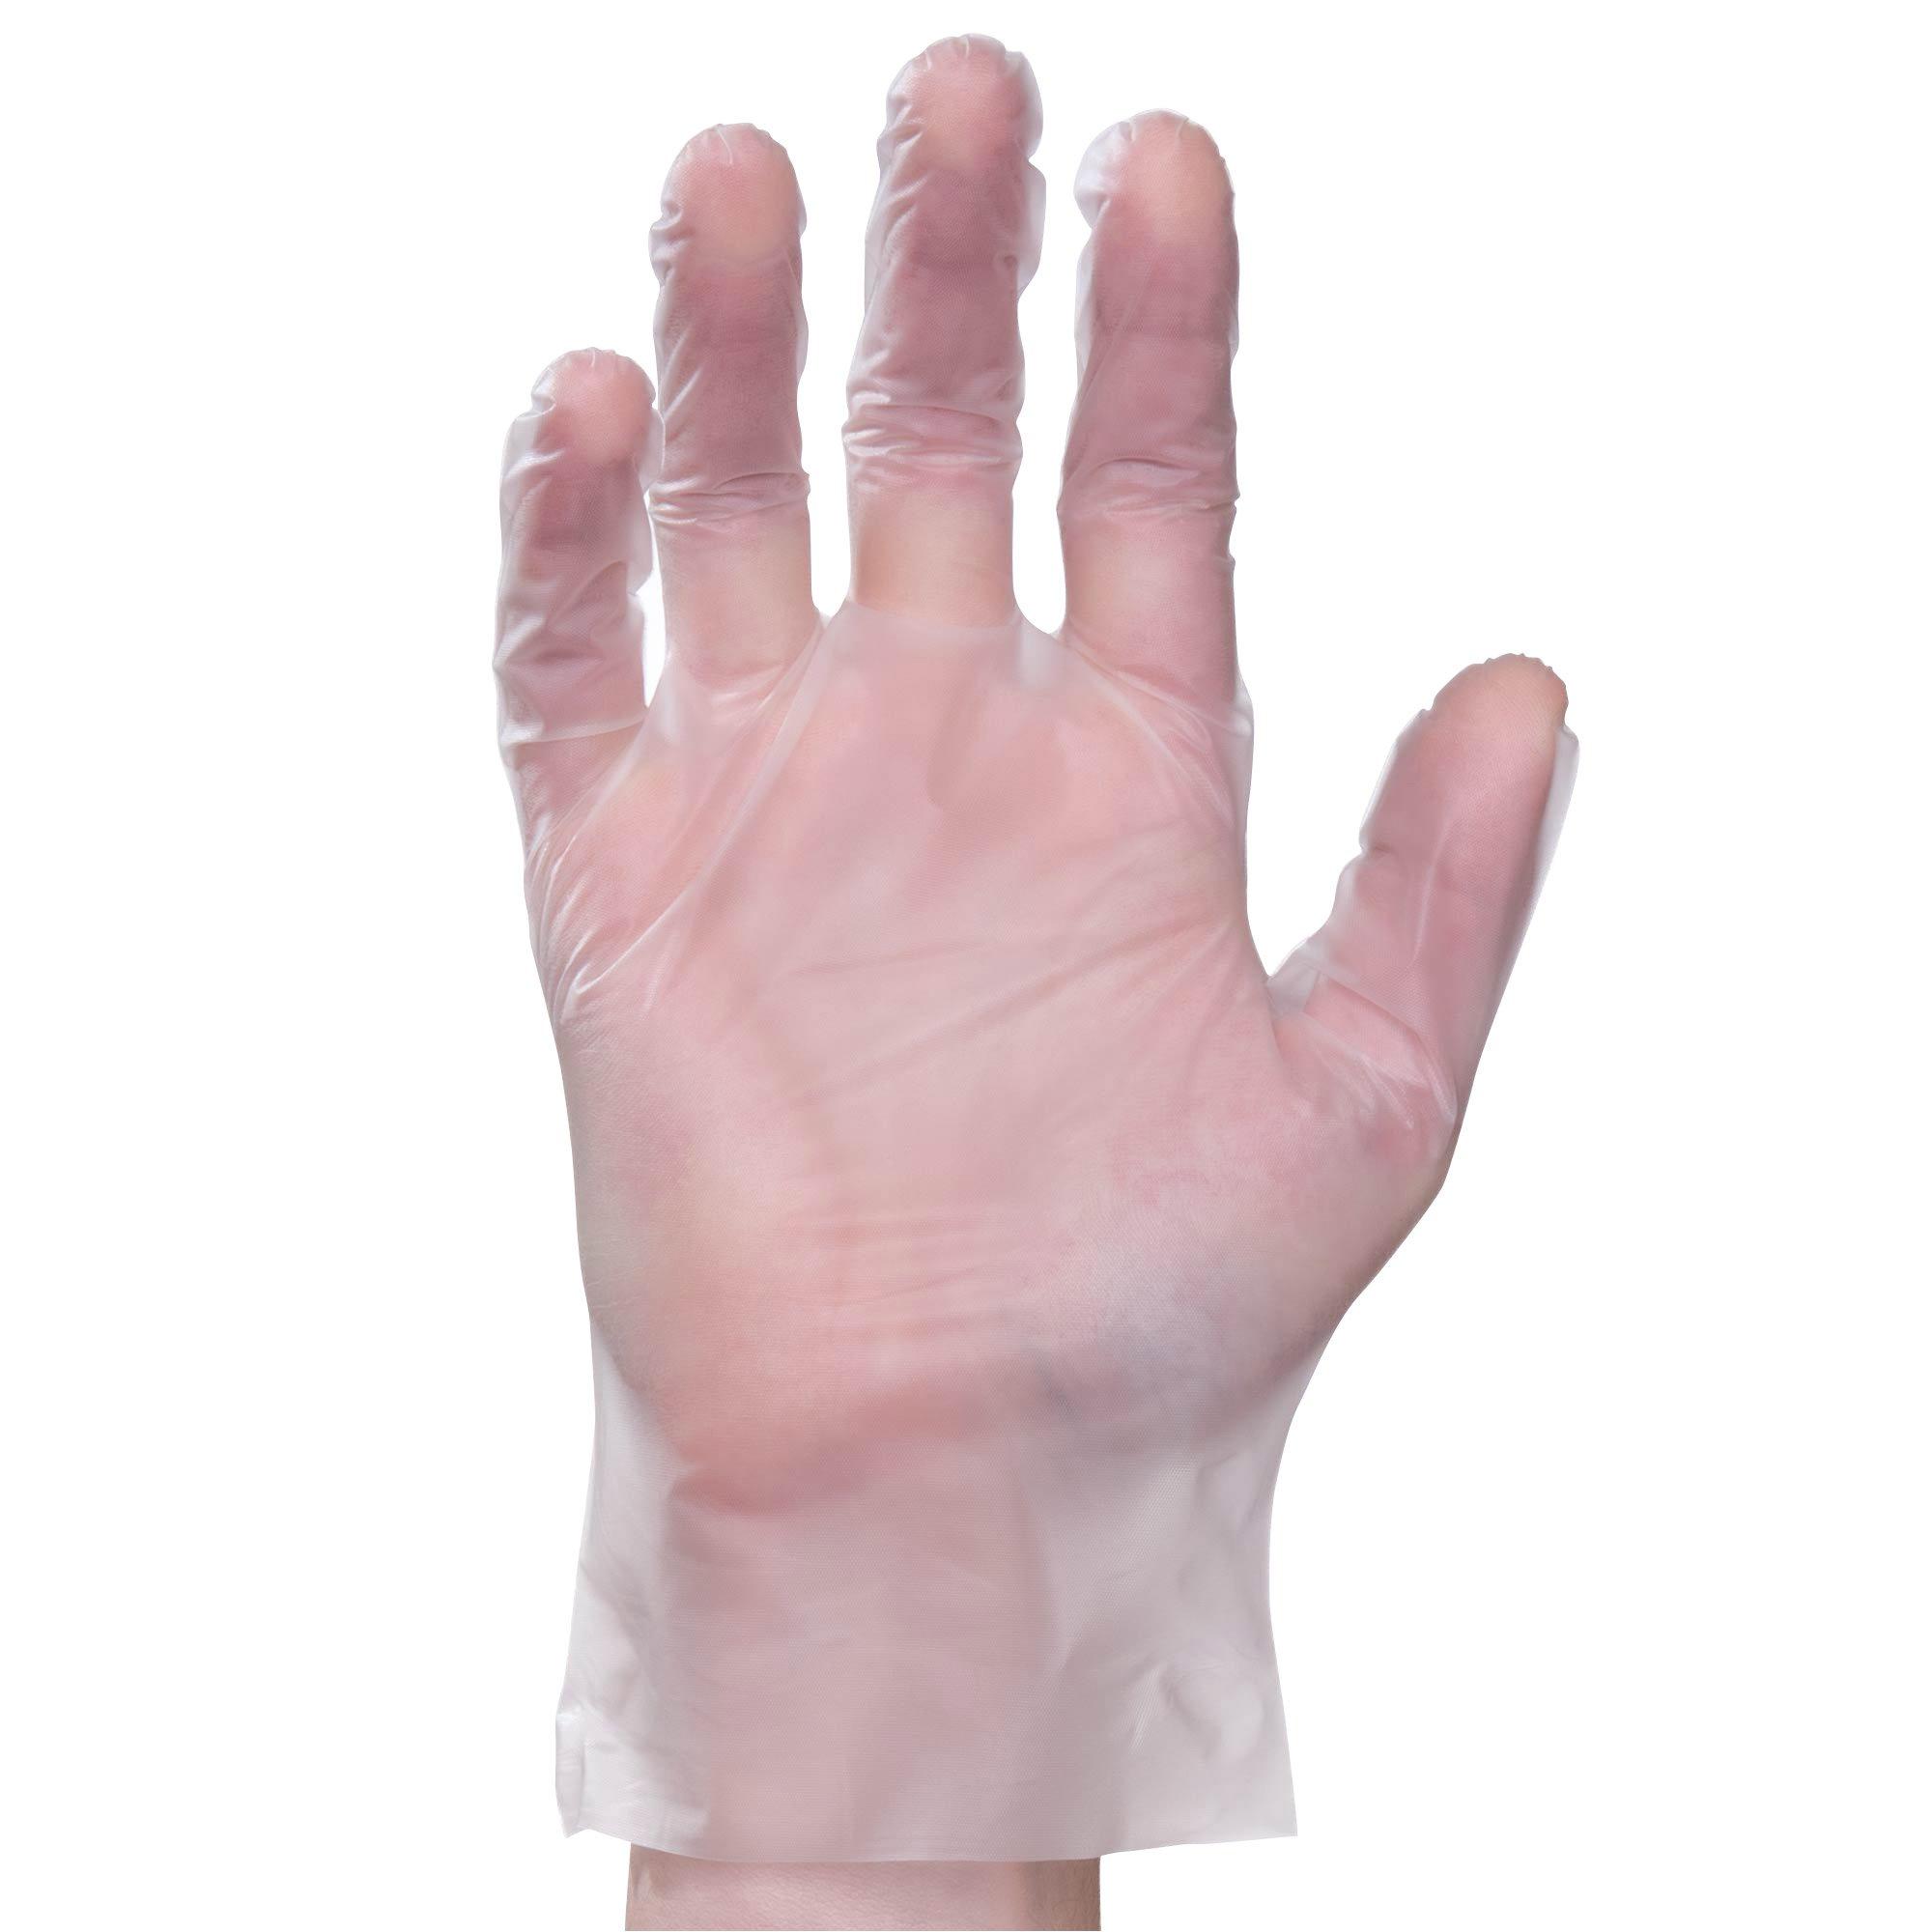 Elara FED201 Digifit Eco Friendly Elastipolymer Hybrid Glove, Phthalate Free, PVC Free, BPA Free, Latex Free, Powder Free, Food Service, Industrial, Janitorial, Large (Case of 1000)